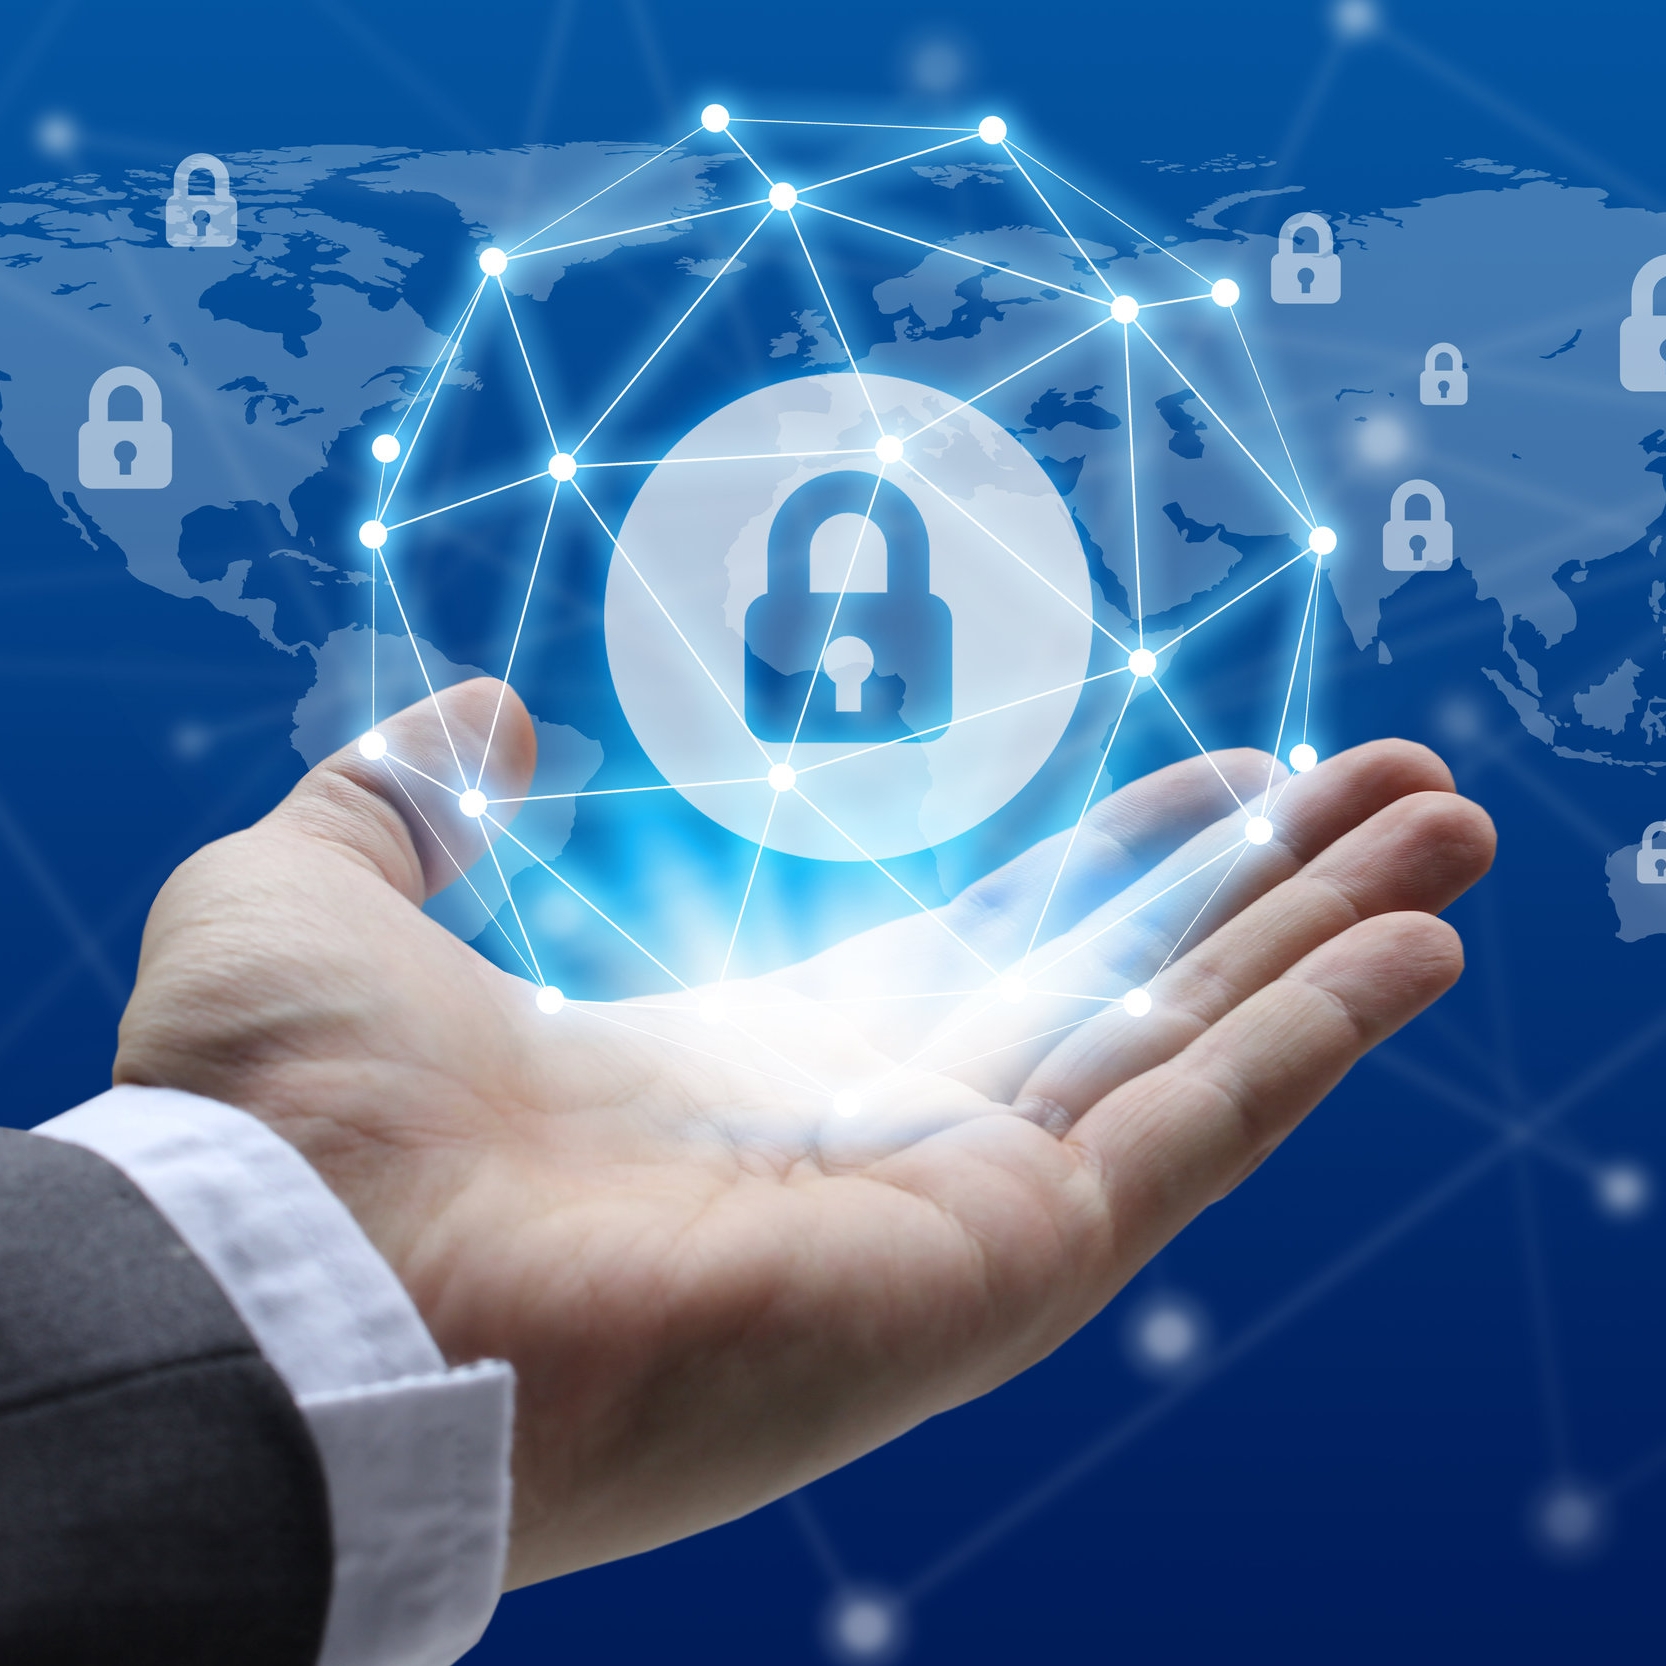 the mandatory data breach notification scheme - well on its way -